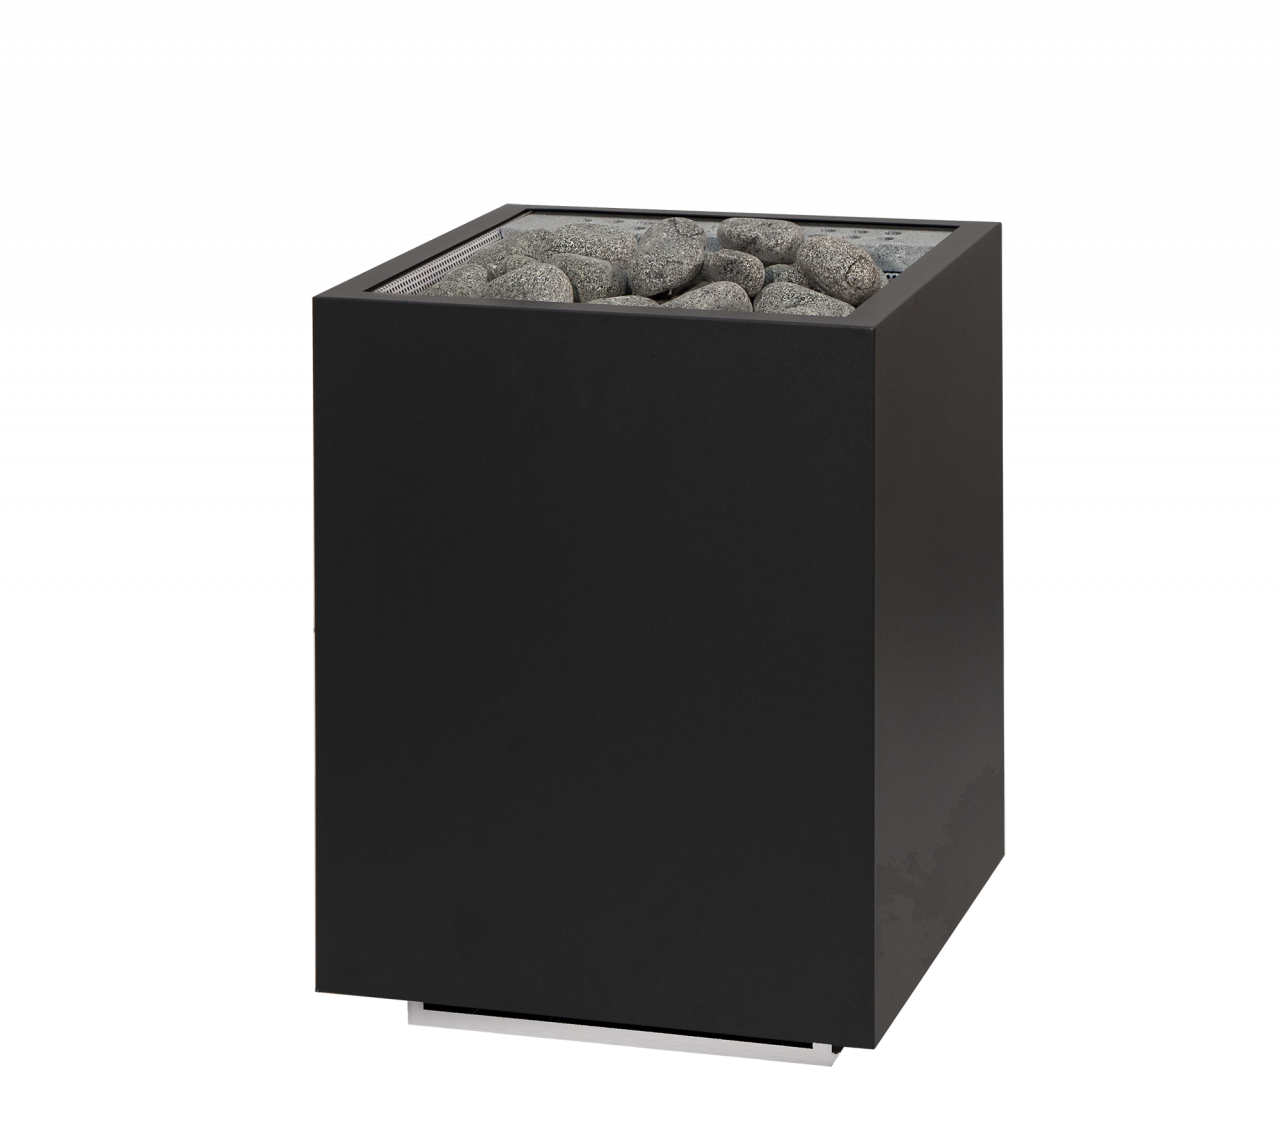 Sentiotec Home Fin Combi oven